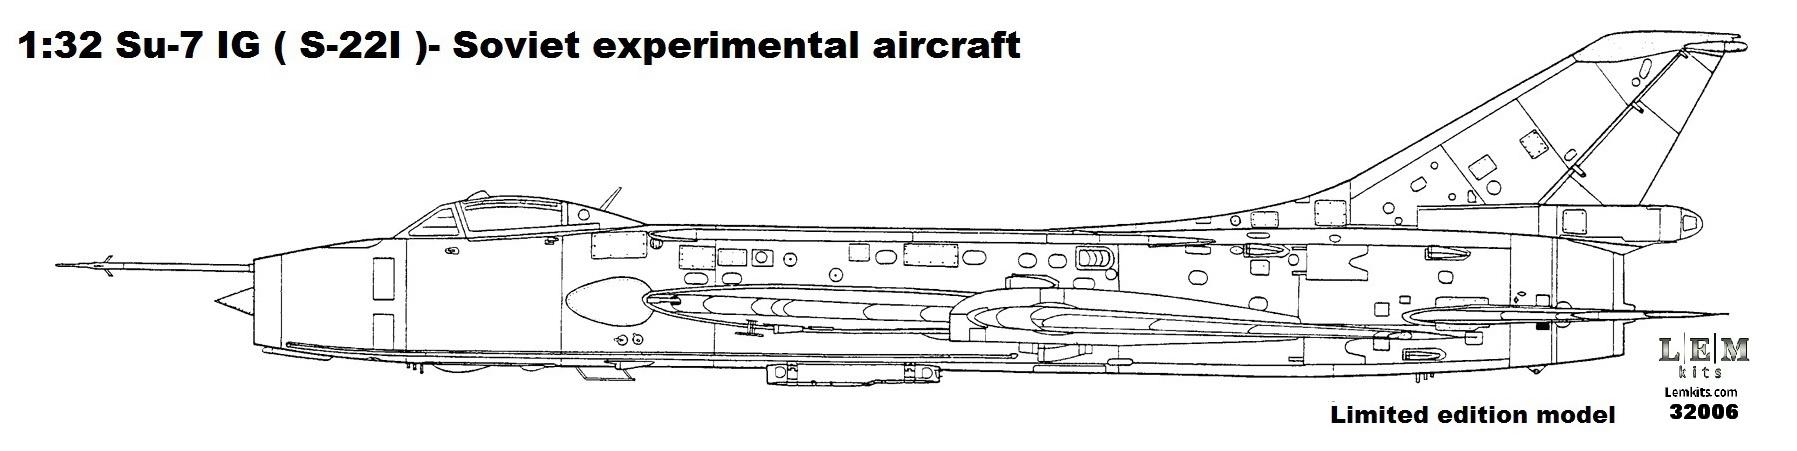 1:32 Su-7 IG ( S-22I ) -Limited edition resin model kit